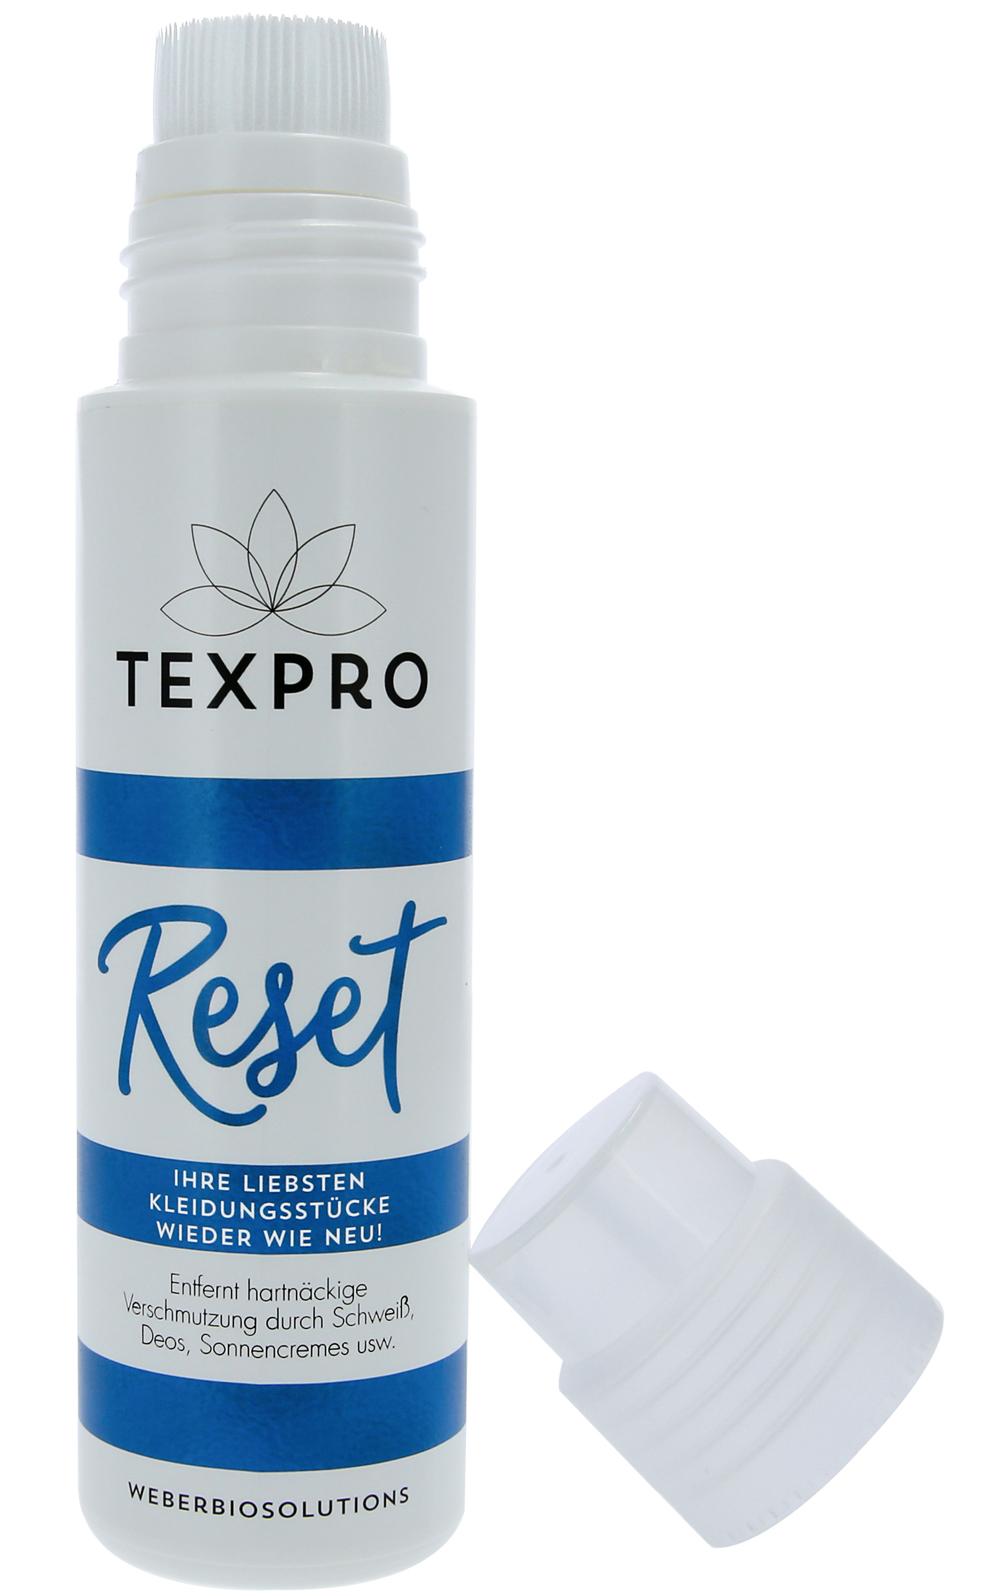 TexPro Plus